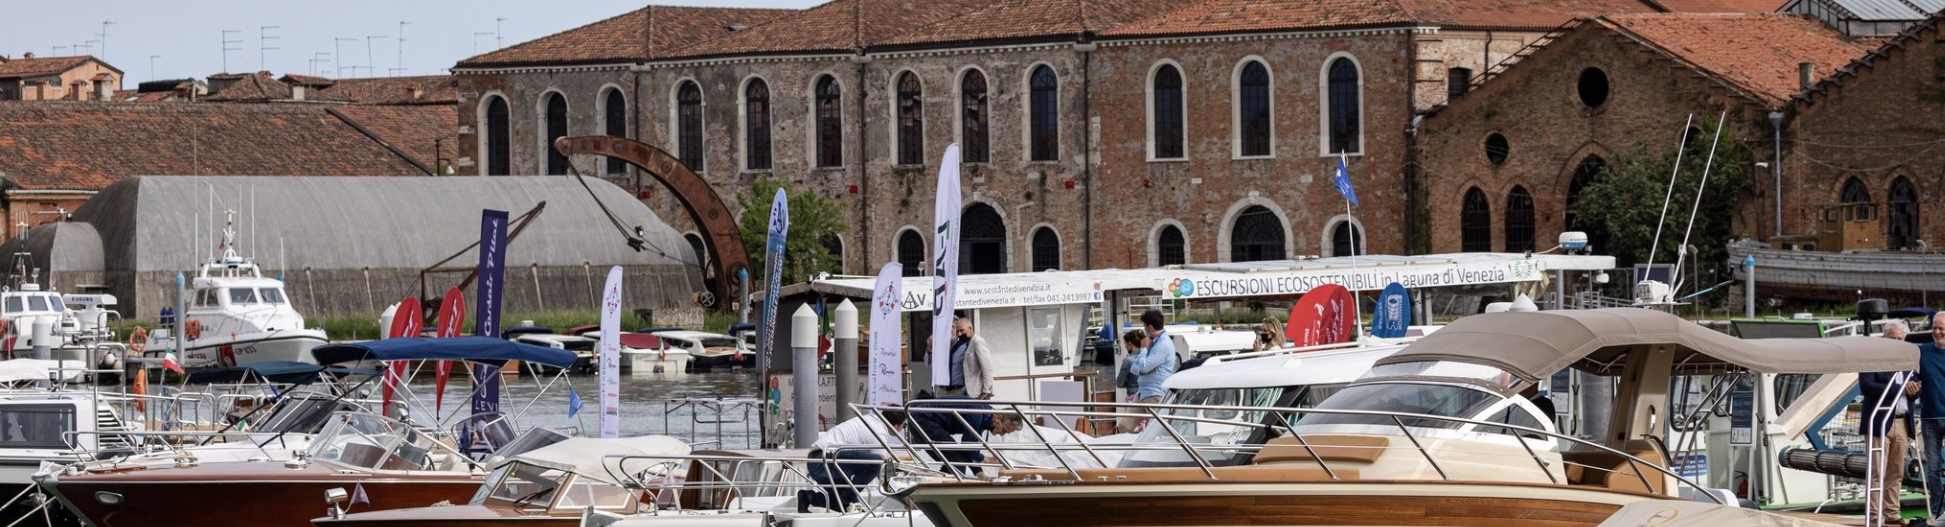 Salón Náutico de Venezia 2021